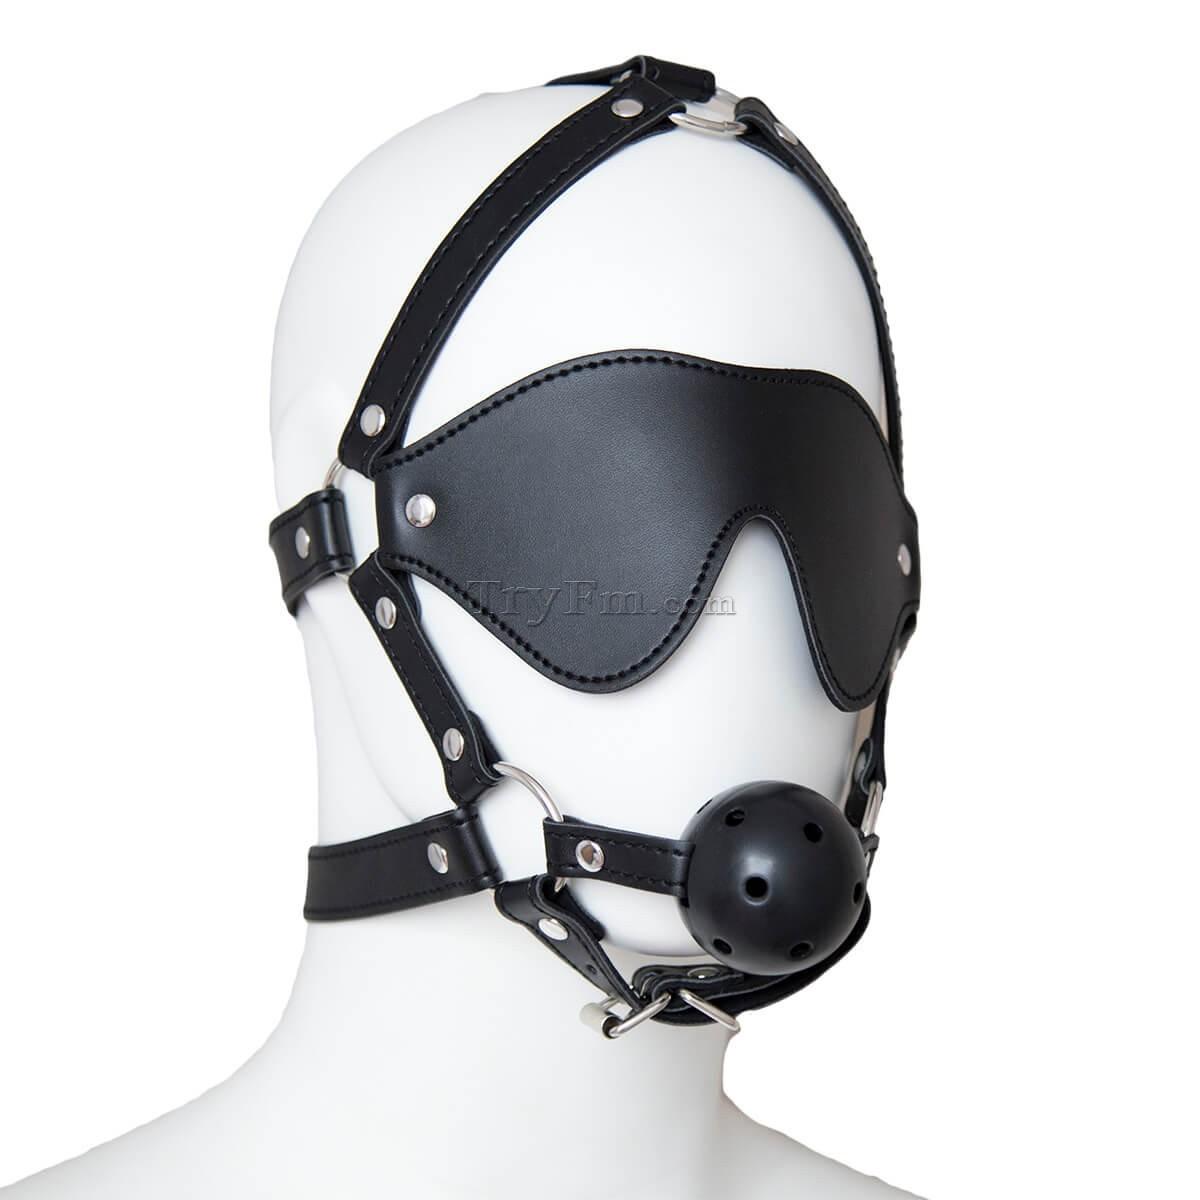 24-Blindfold-Harness-and-Ball-Gag-6.jpg